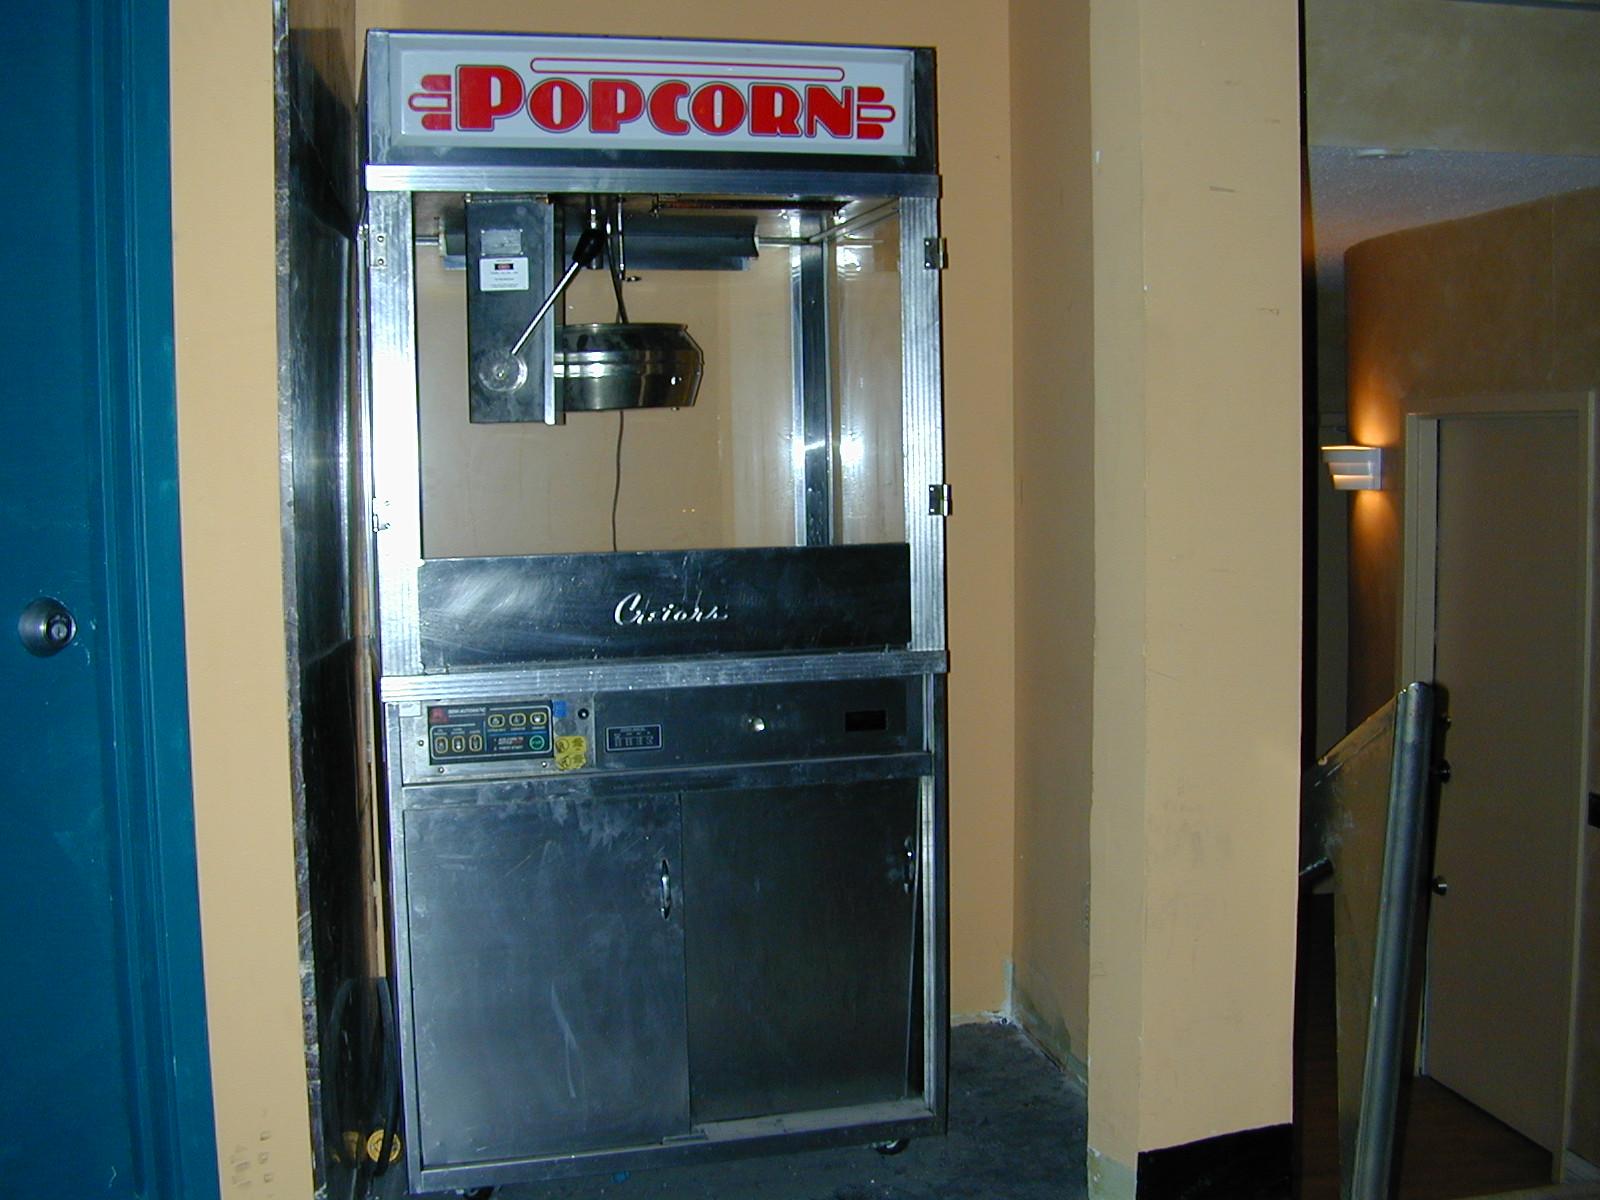 popcorn mschine.JPG